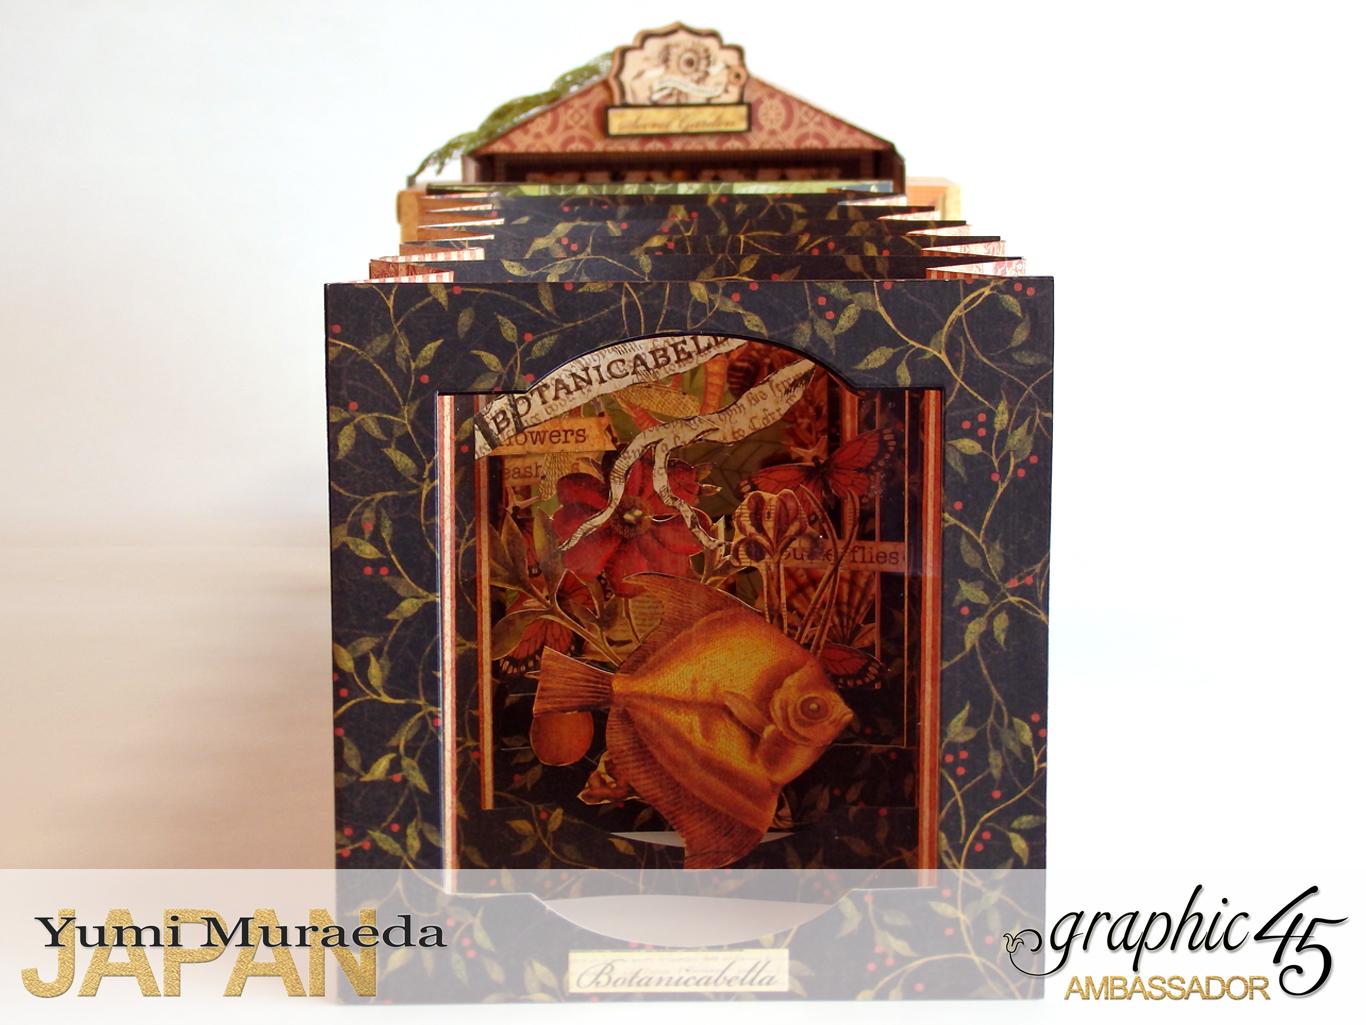 6Secret Gaden Museum, Botanicabella, by Yumi Muraeda, Product by Graphic 45jpg